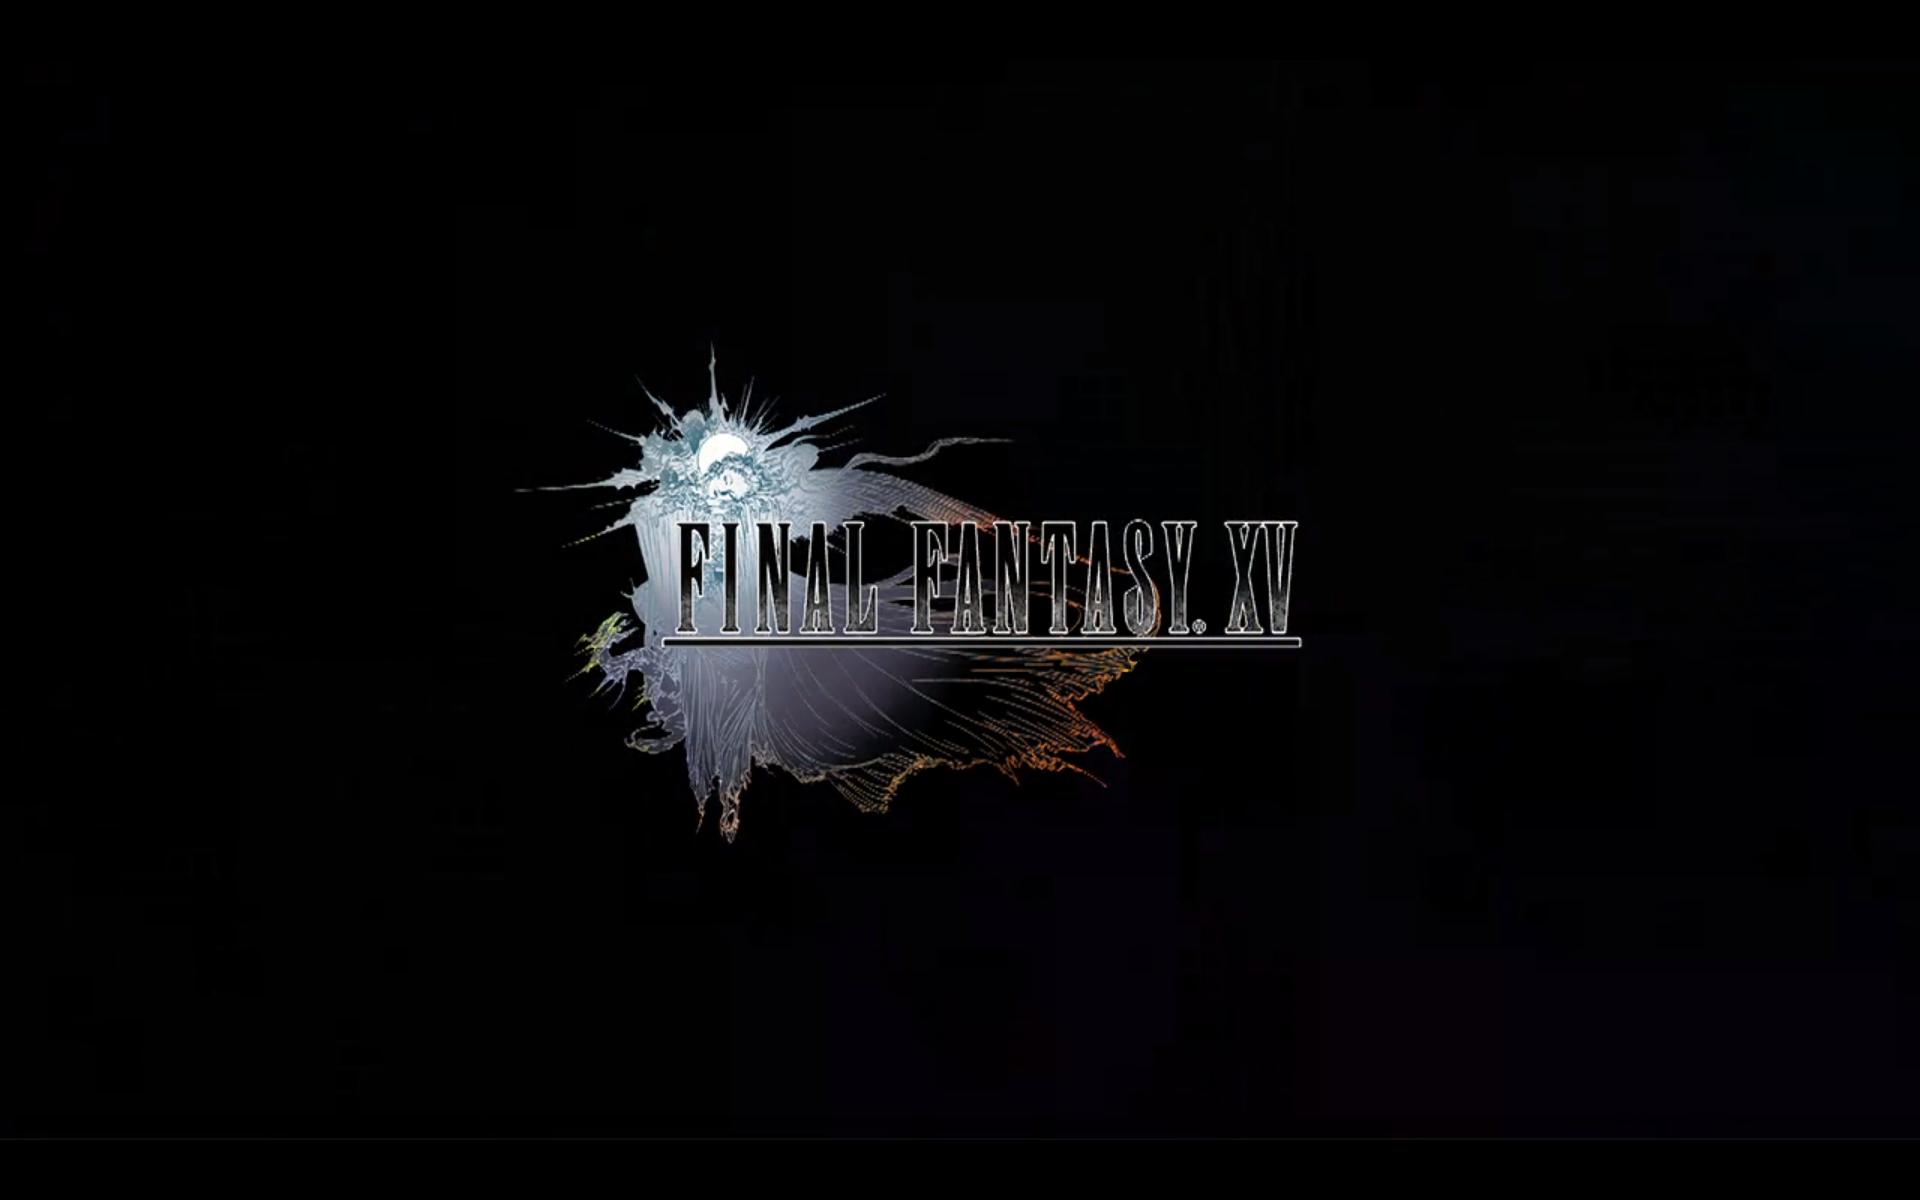 Final Fantasy Type 0 Hd Games 4k Wallpapers Images: Final Fantasy XV Wallpaper